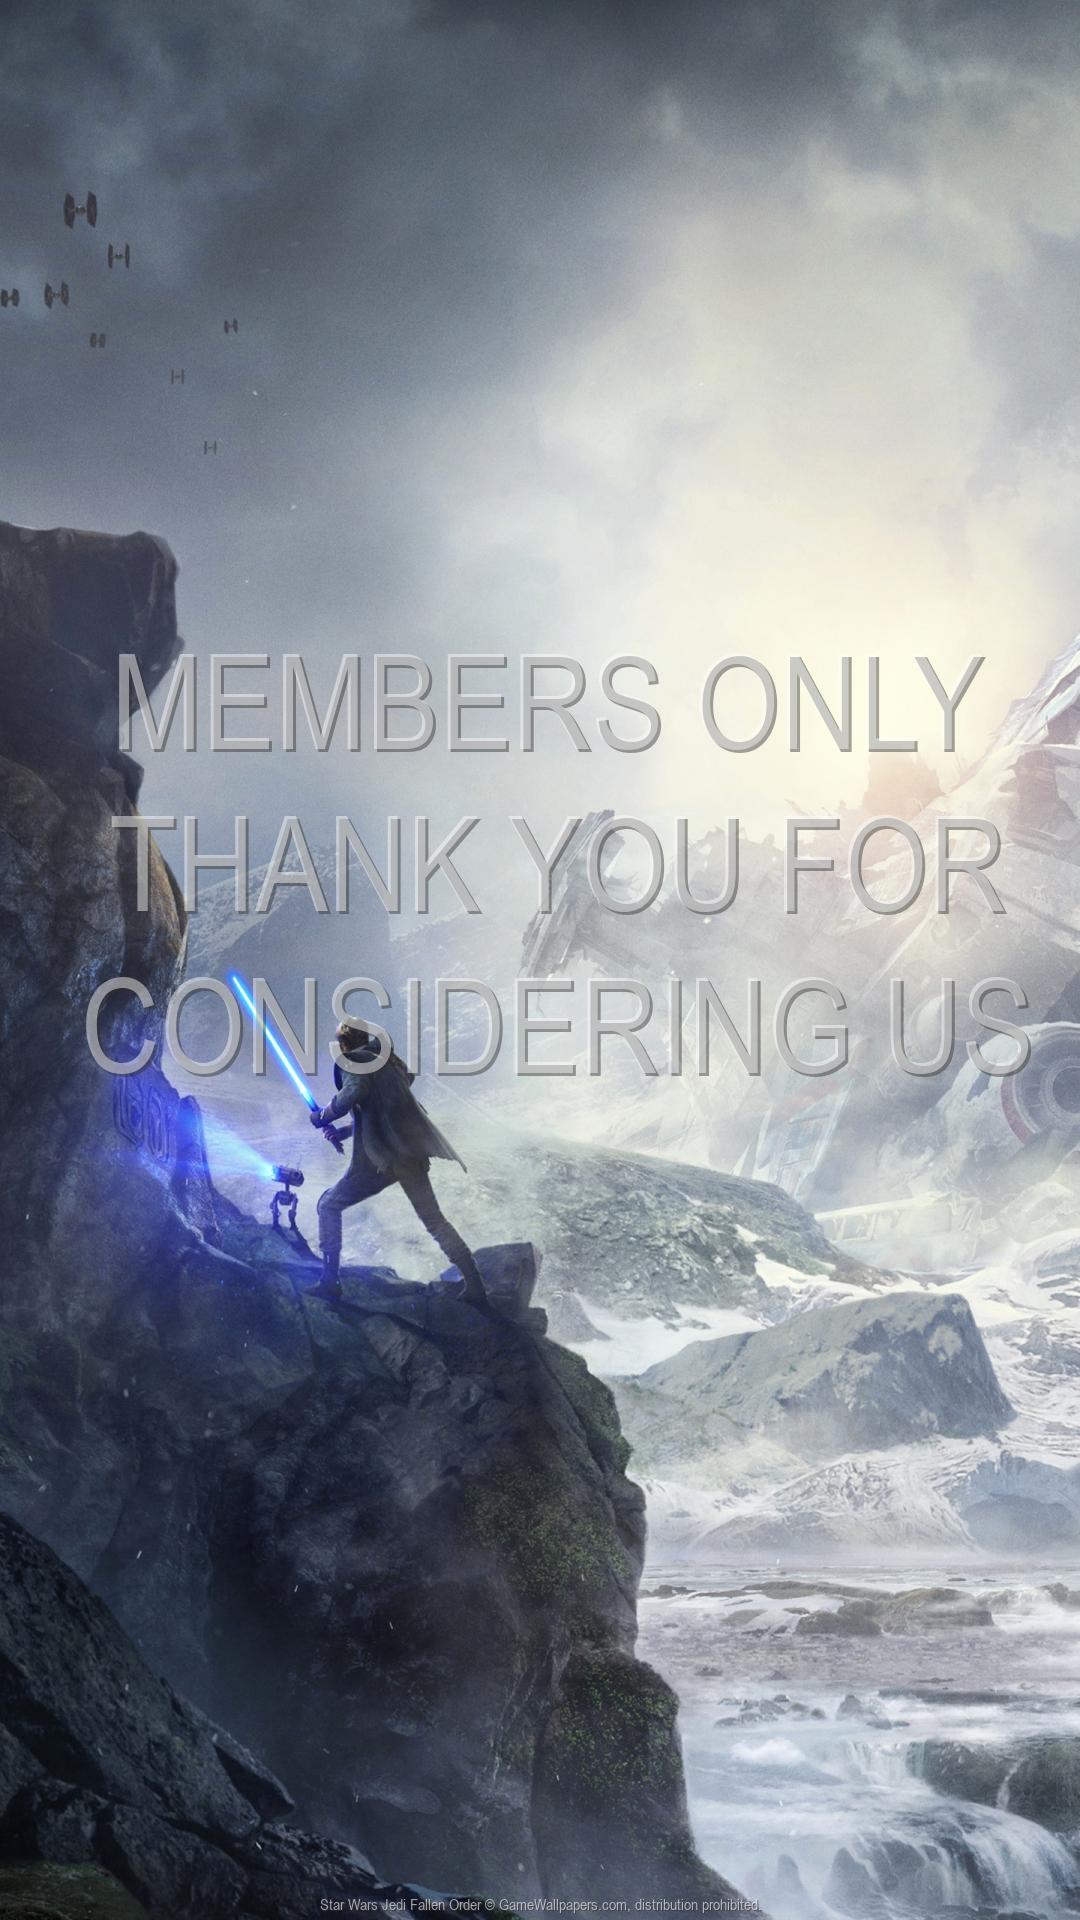 Star Wars Jedi: Fallen Order 1920x1080 Mobile wallpaper or background 02